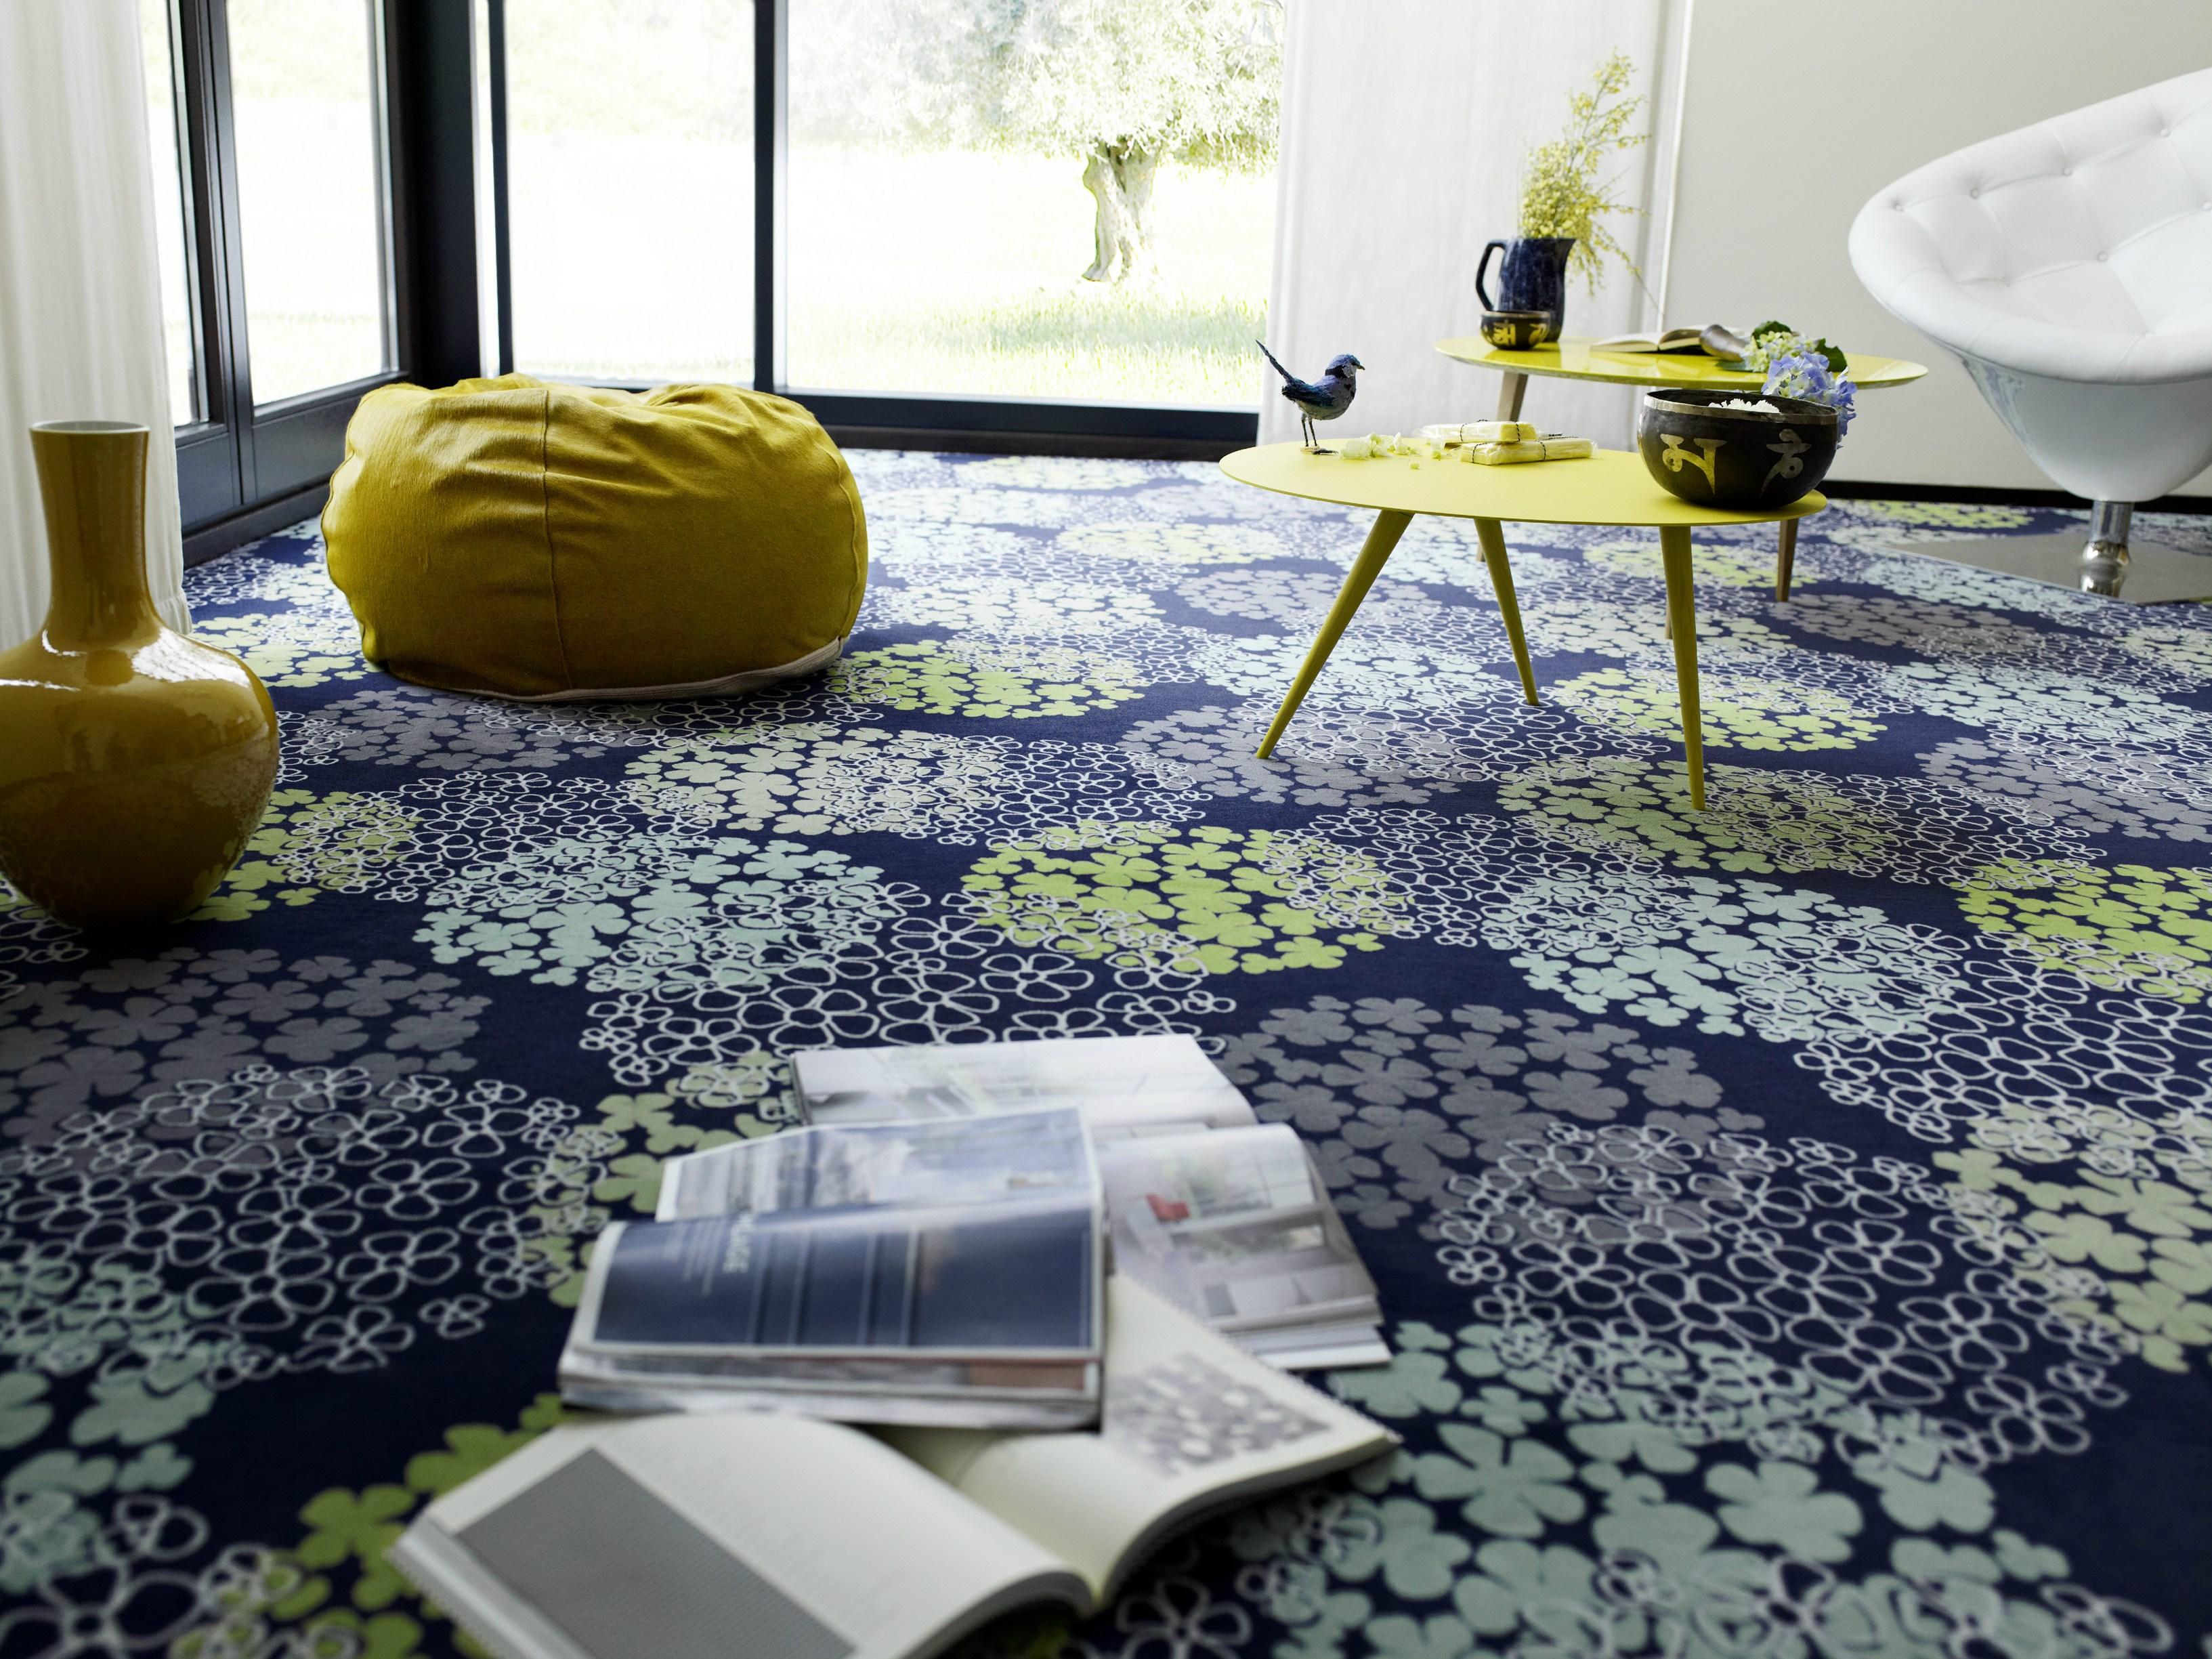 modena design by vorwerk co teppichwerke. Black Bedroom Furniture Sets. Home Design Ideas